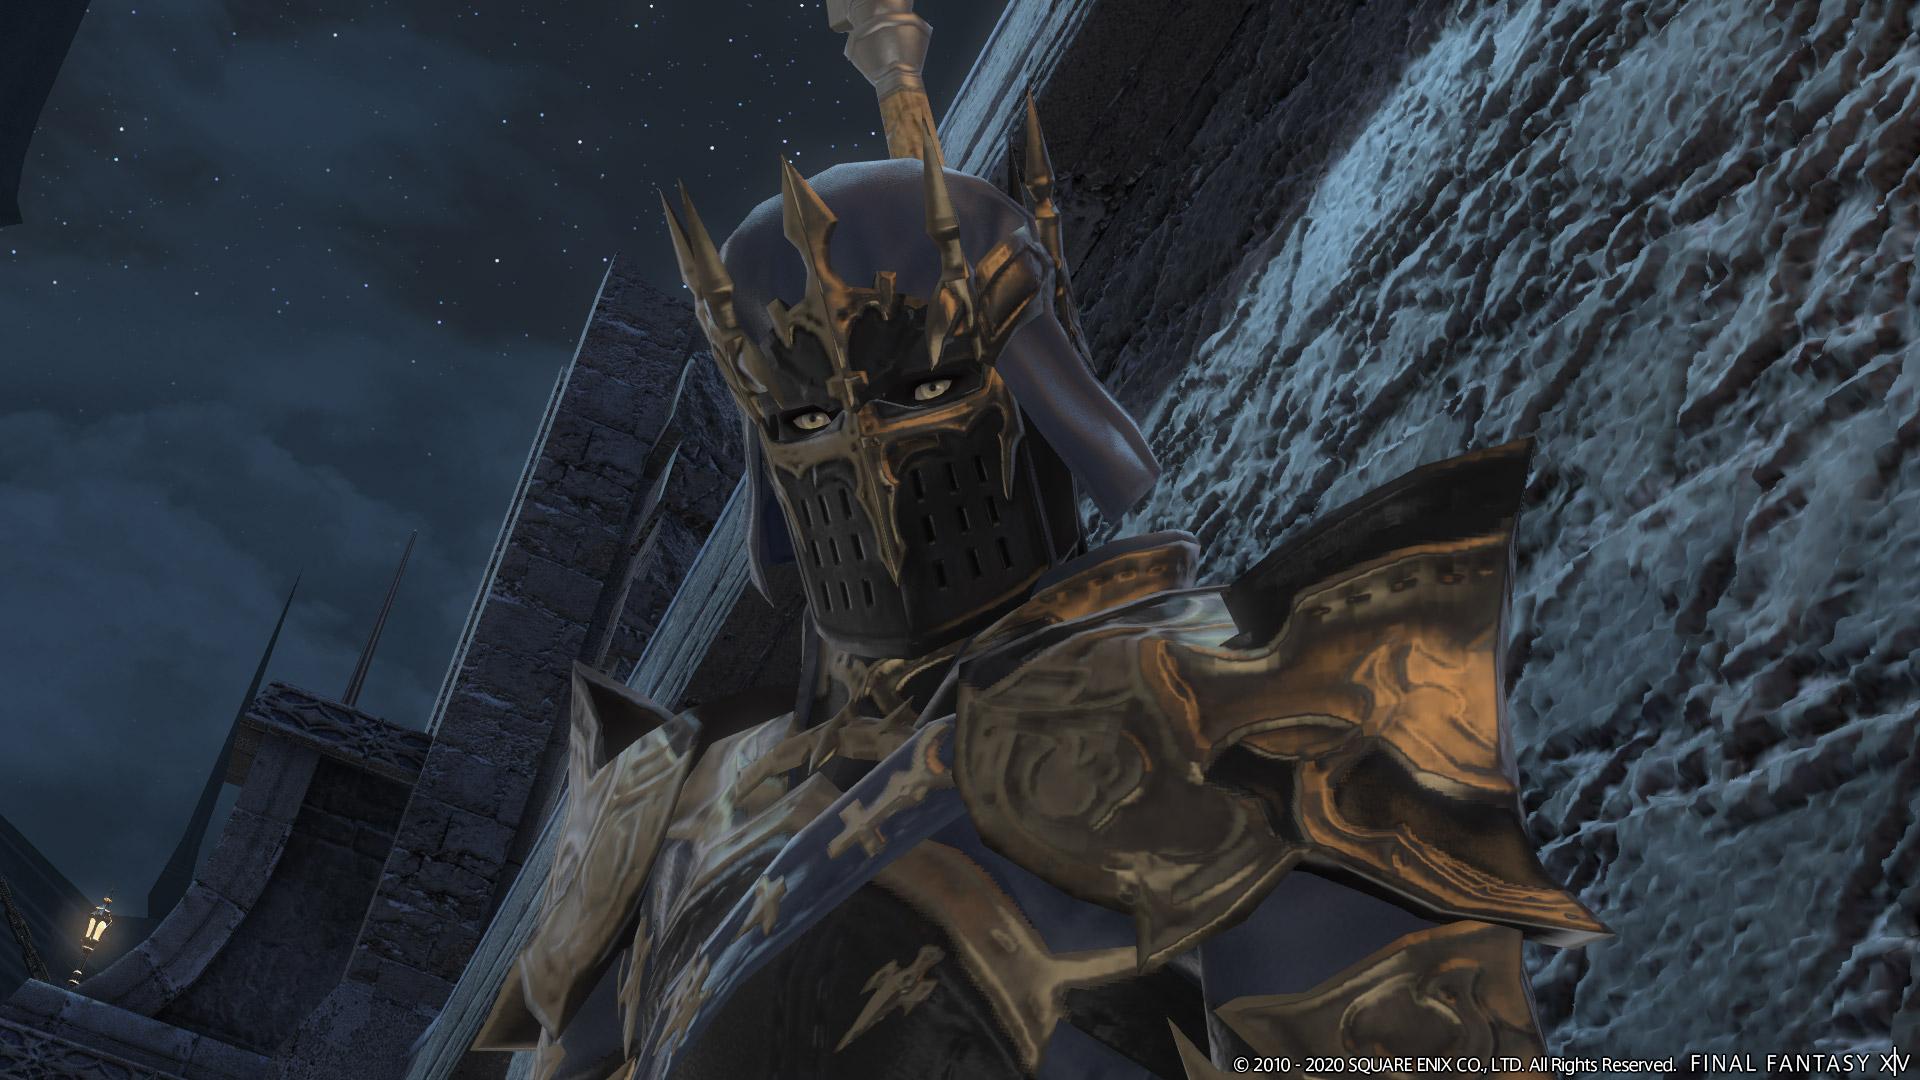 Final Fantasy XIV 5.4 Tomestone gear New Game+